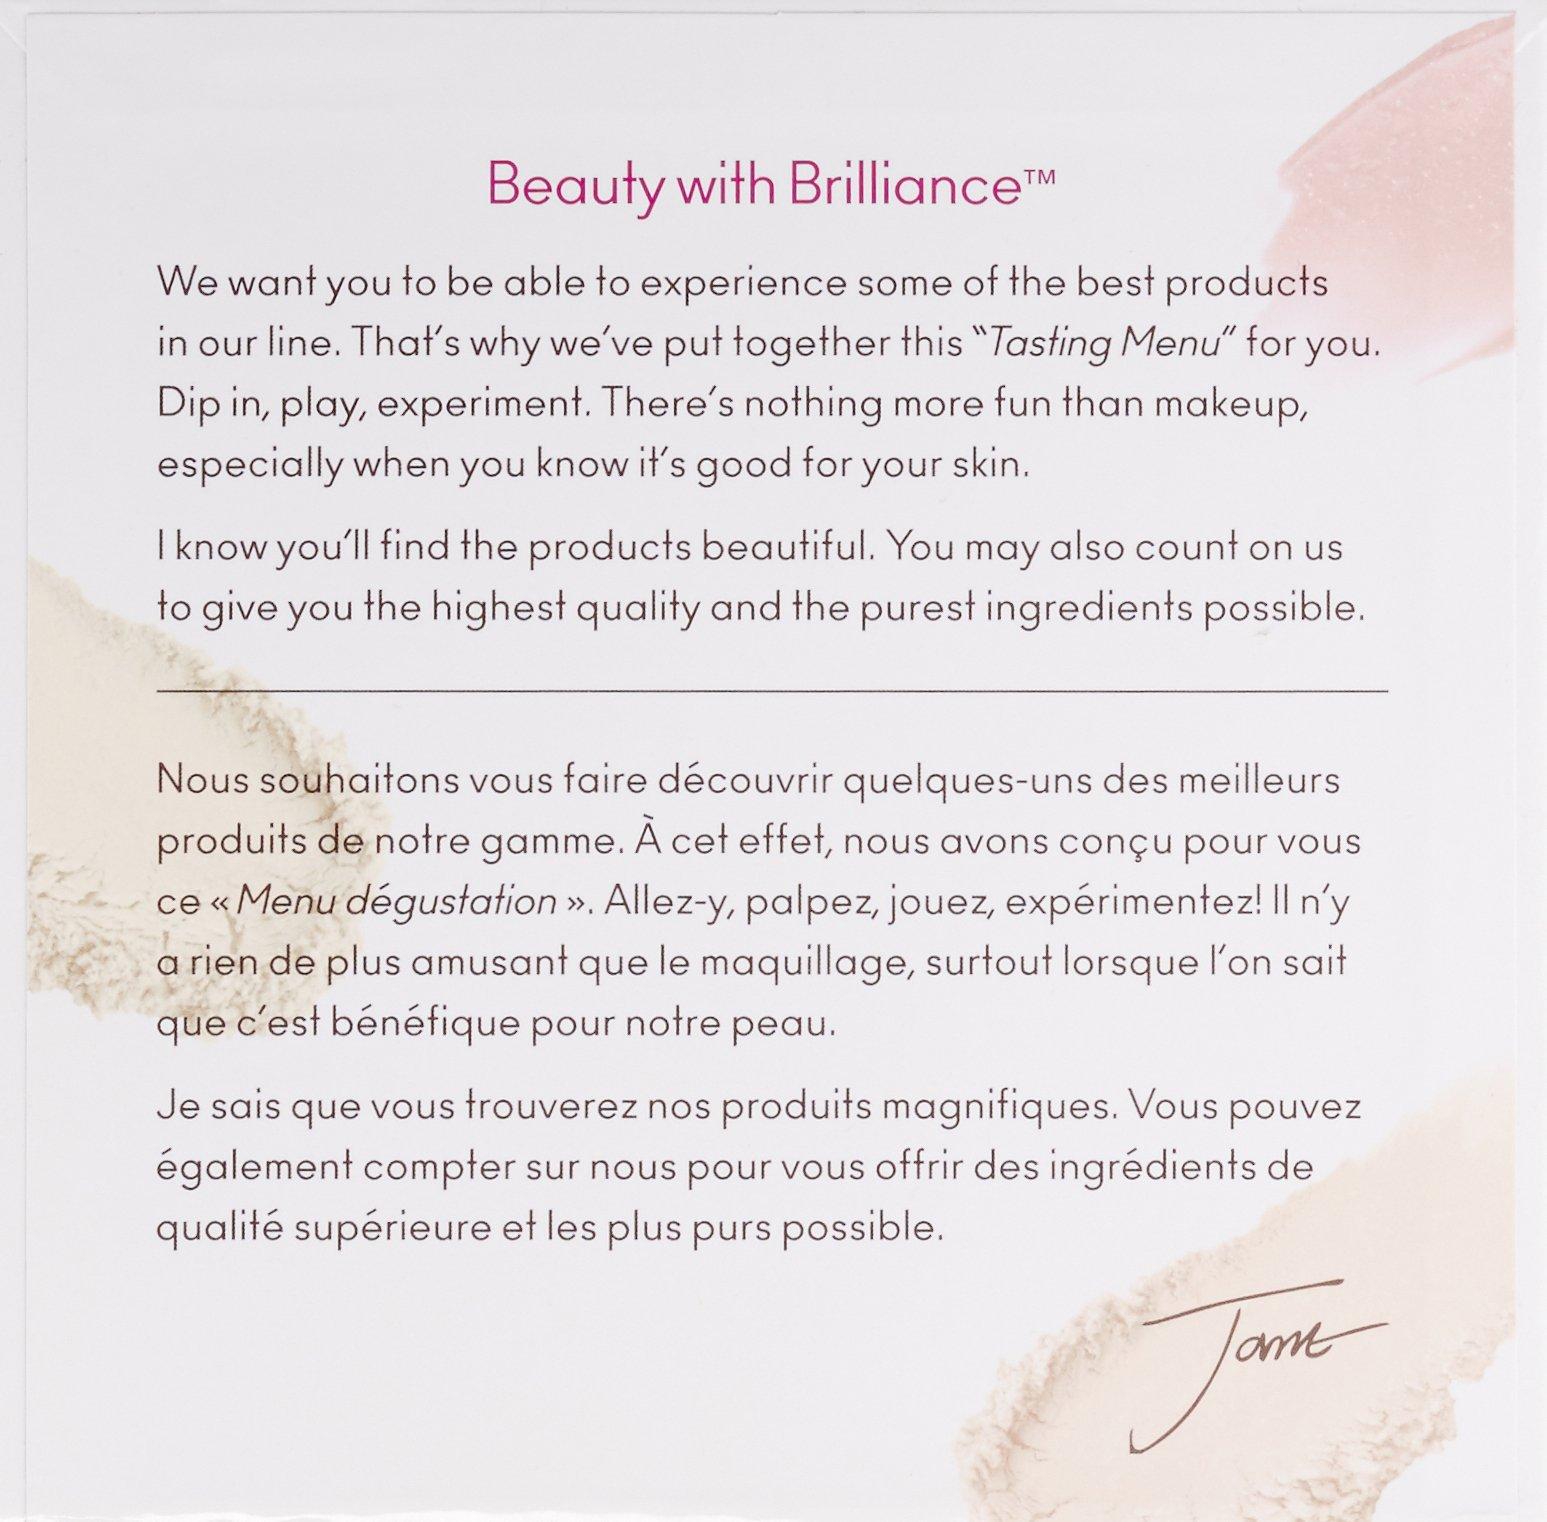 jane iredale Pure & Simple Makeup Kit, Medium.40 oz. by jane iredale (Image #8)